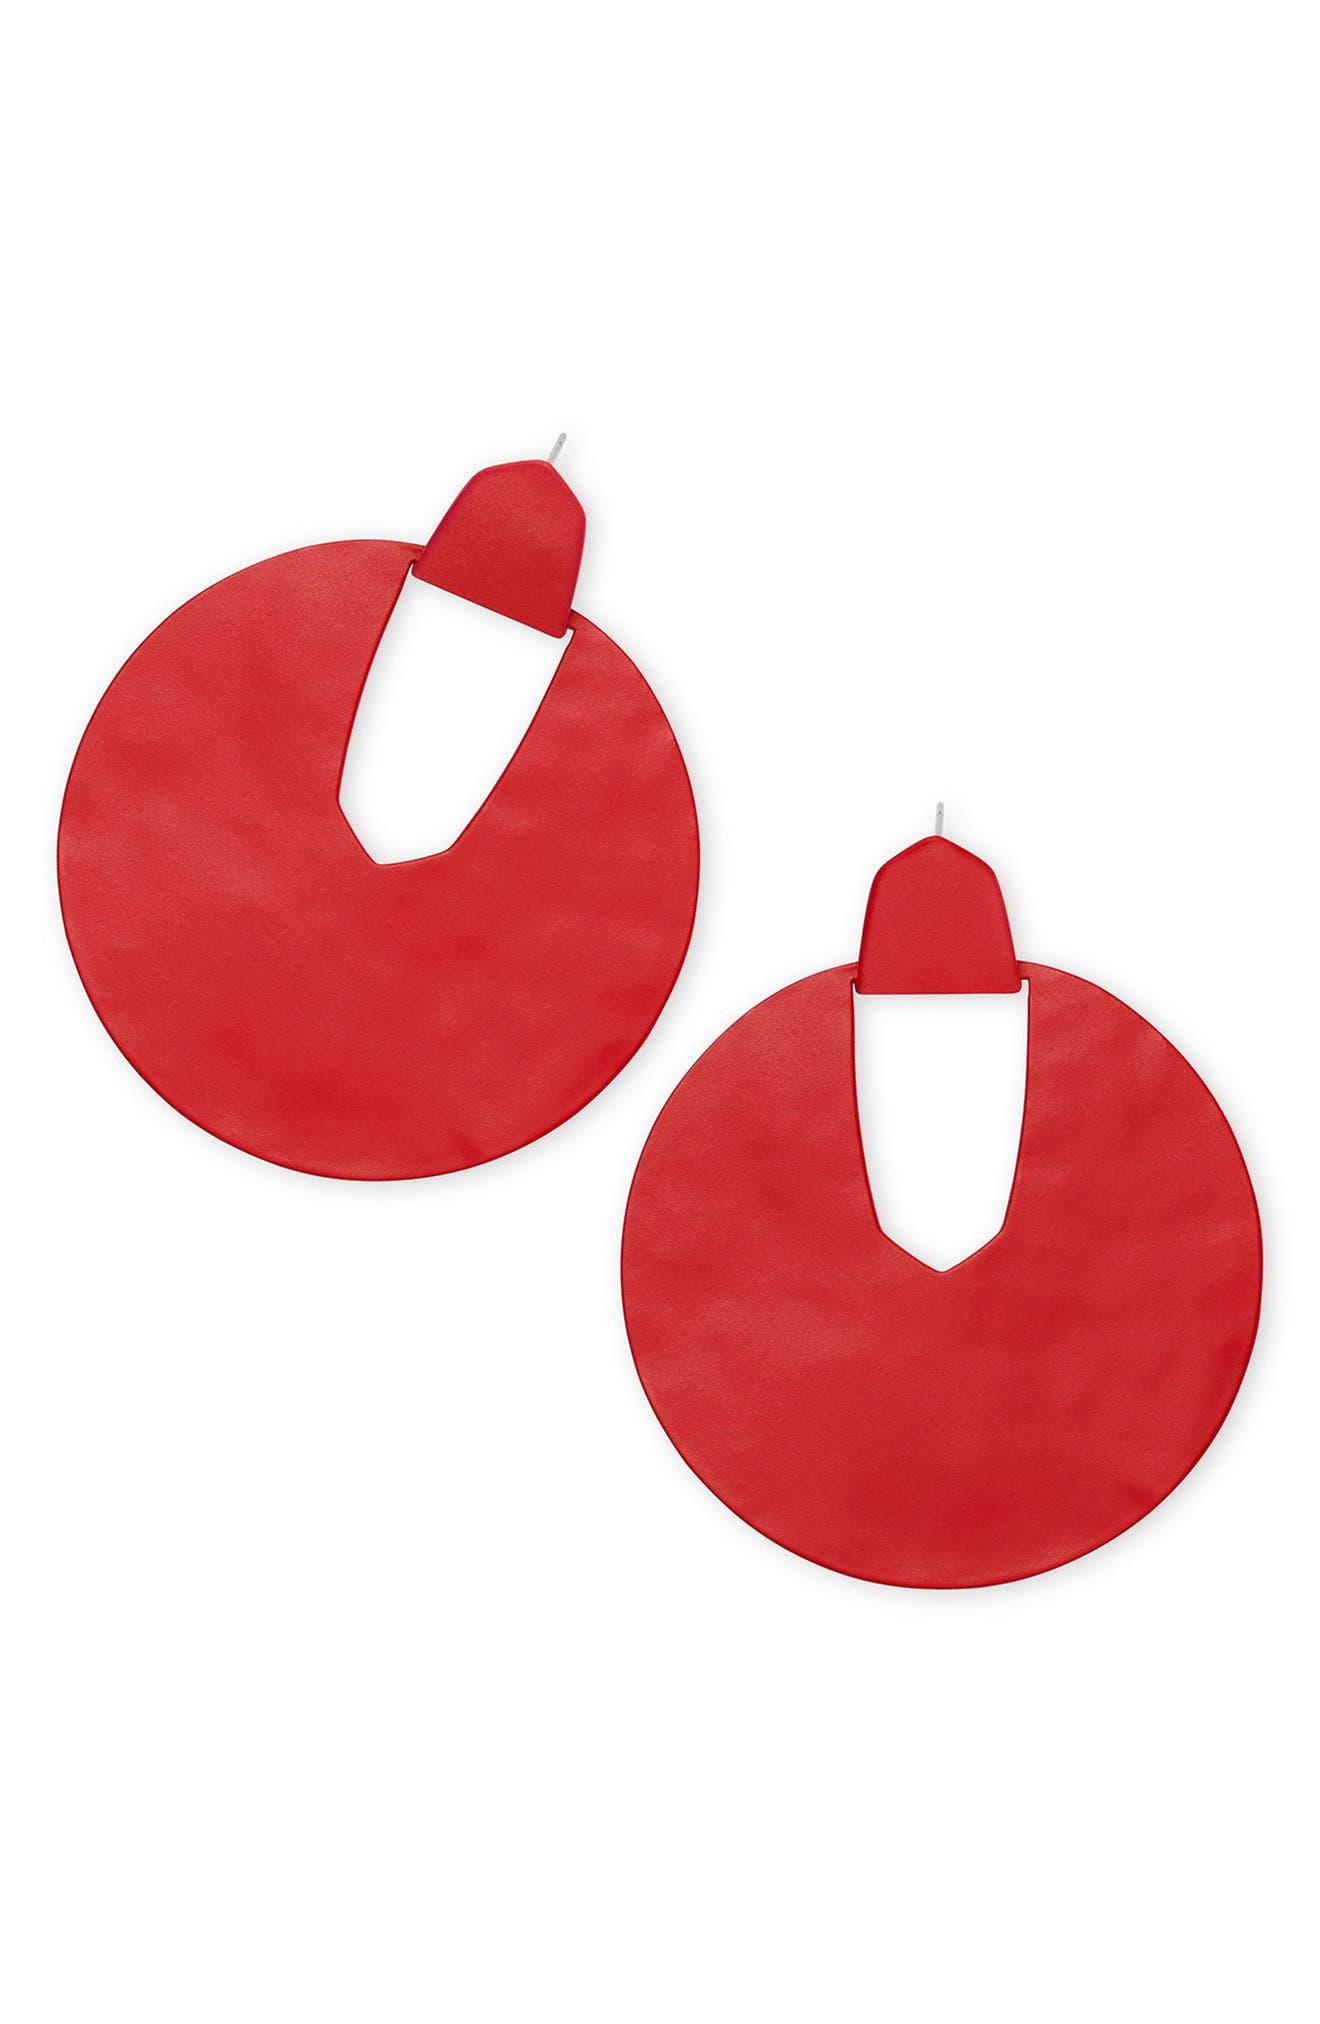 Diane Drop Earrings,                             Main thumbnail 1, color,                             Matte Bright Red